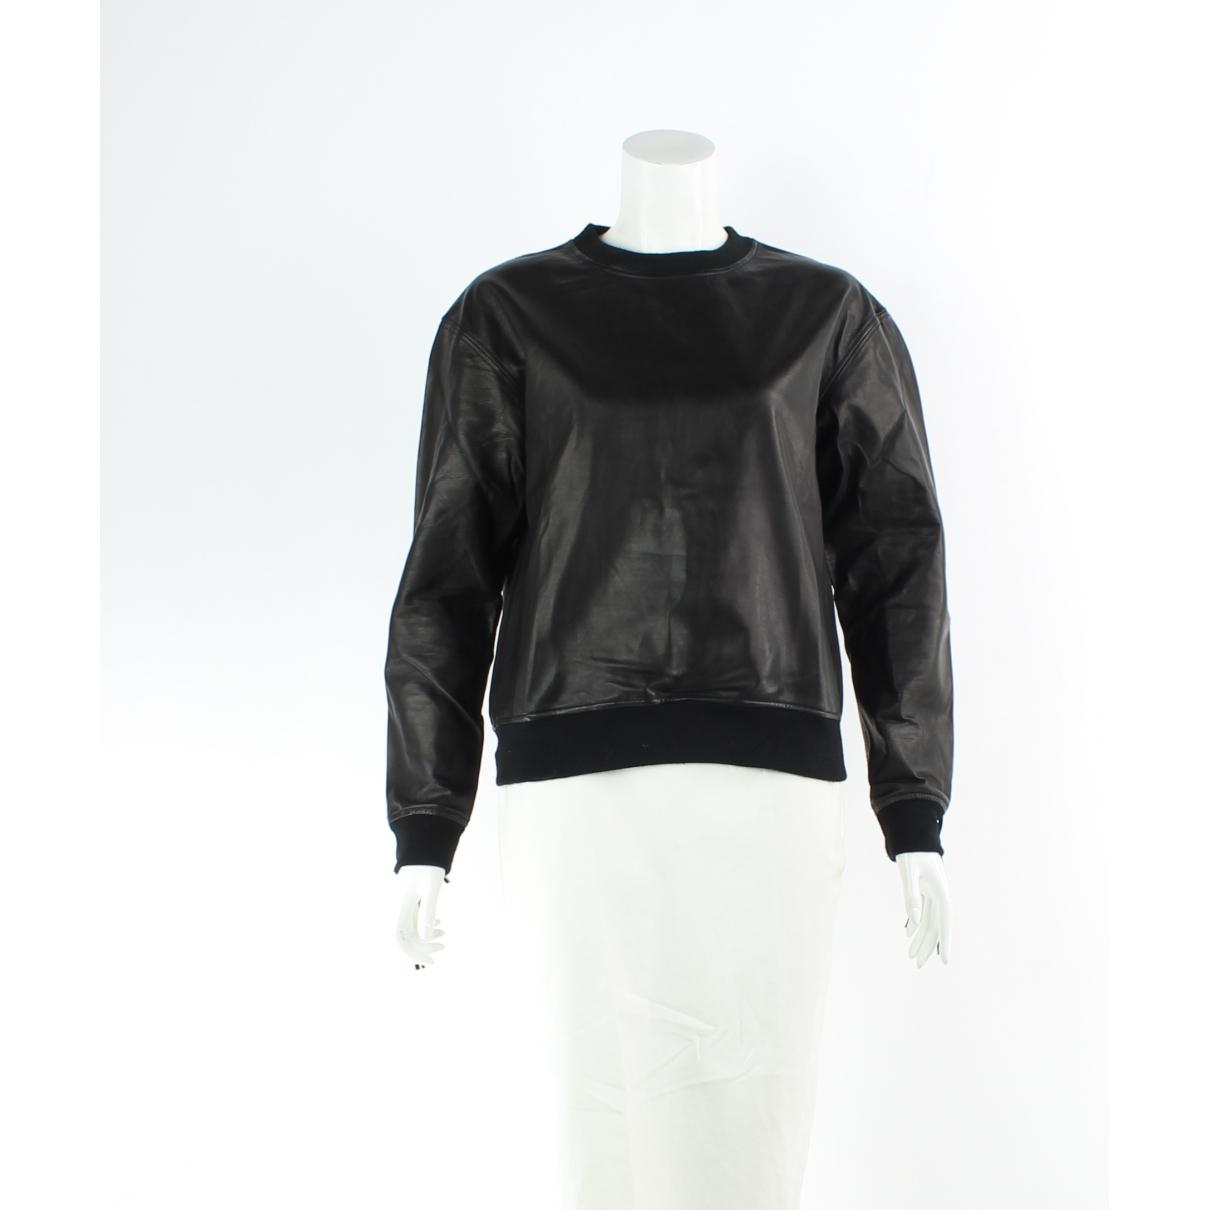 Alexander Wang - Top   pour femme en cuir - noir